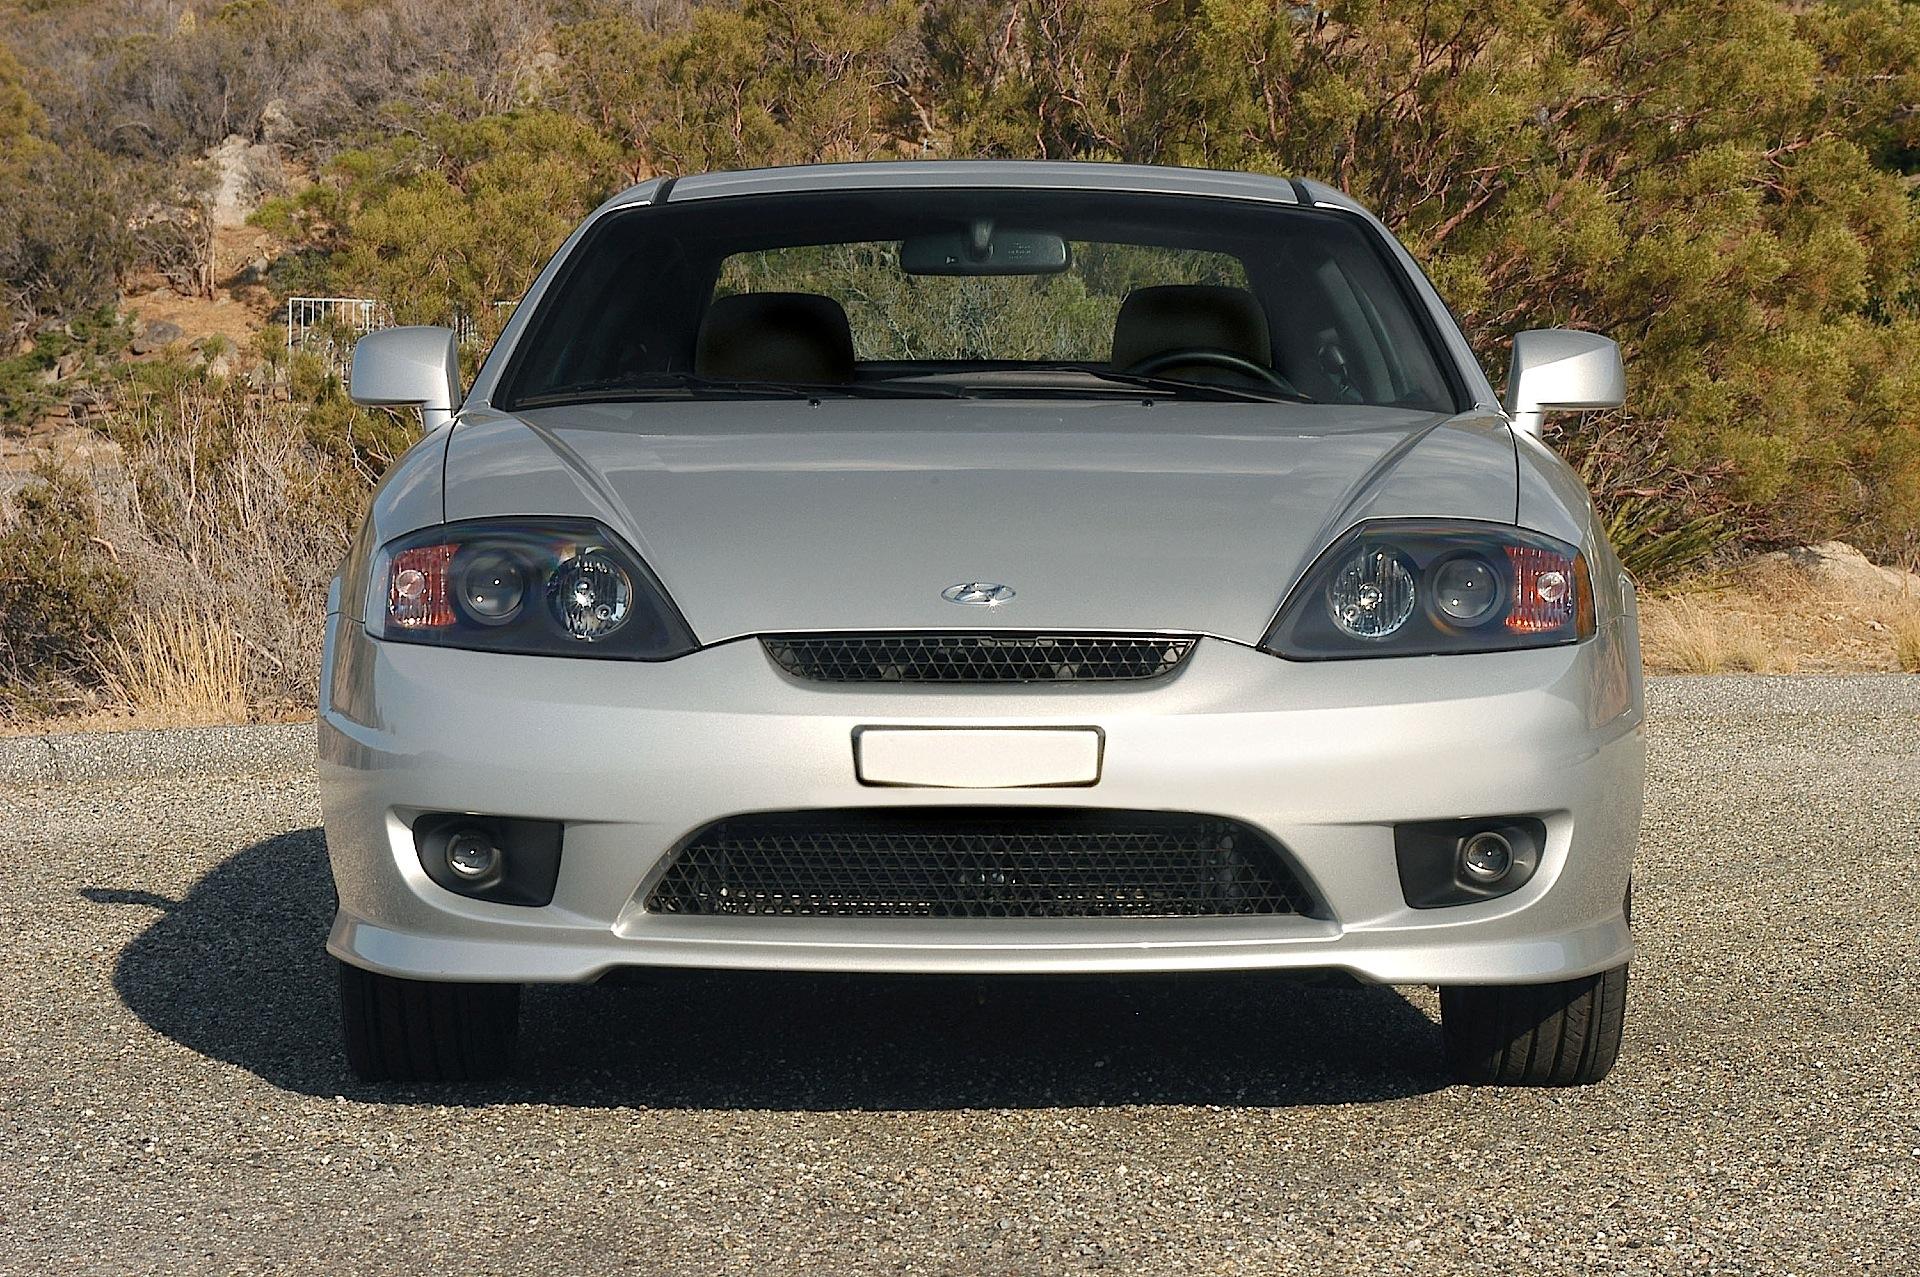 2004 hyundai tiburon headlights